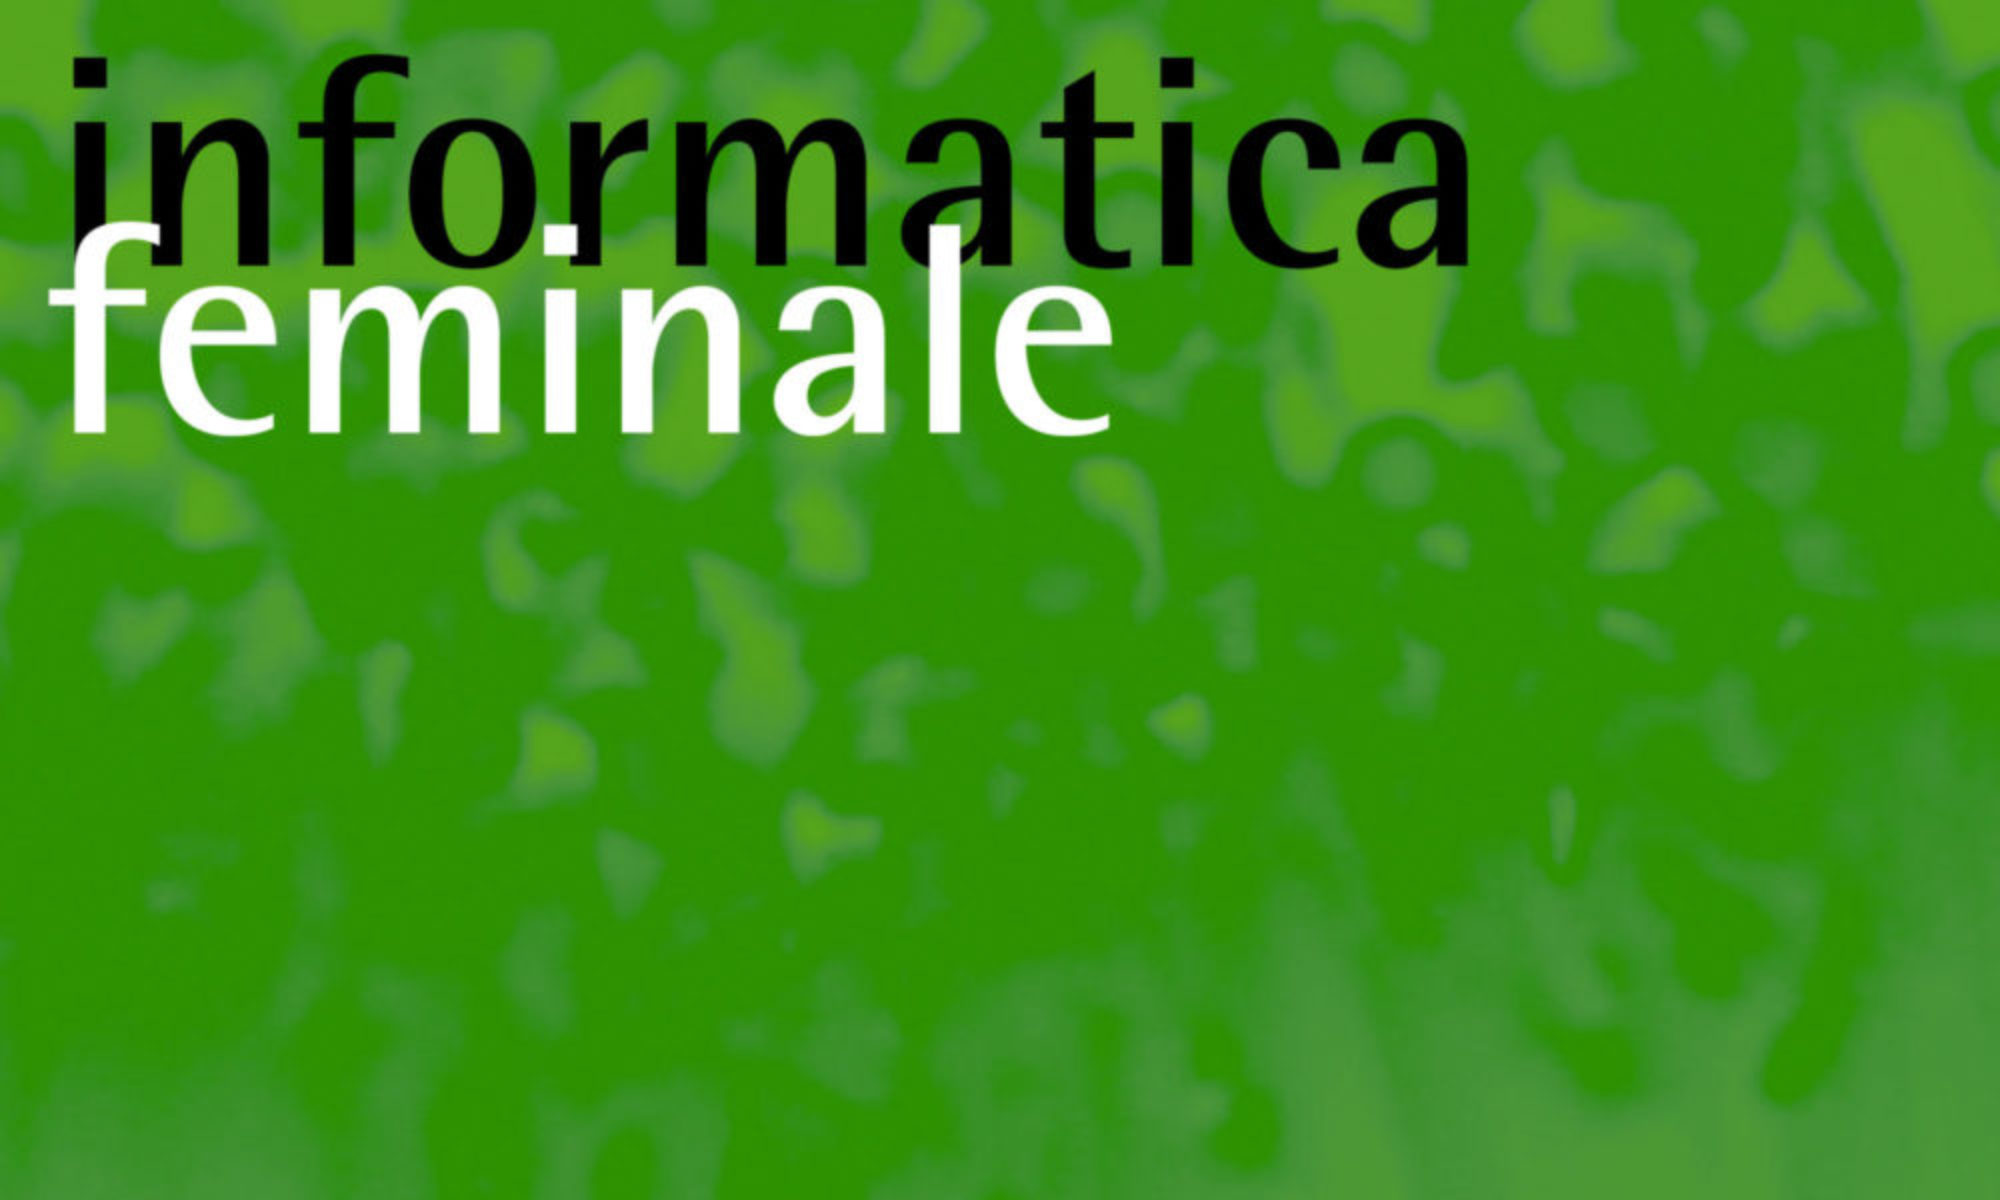 21. Informatica Feminale